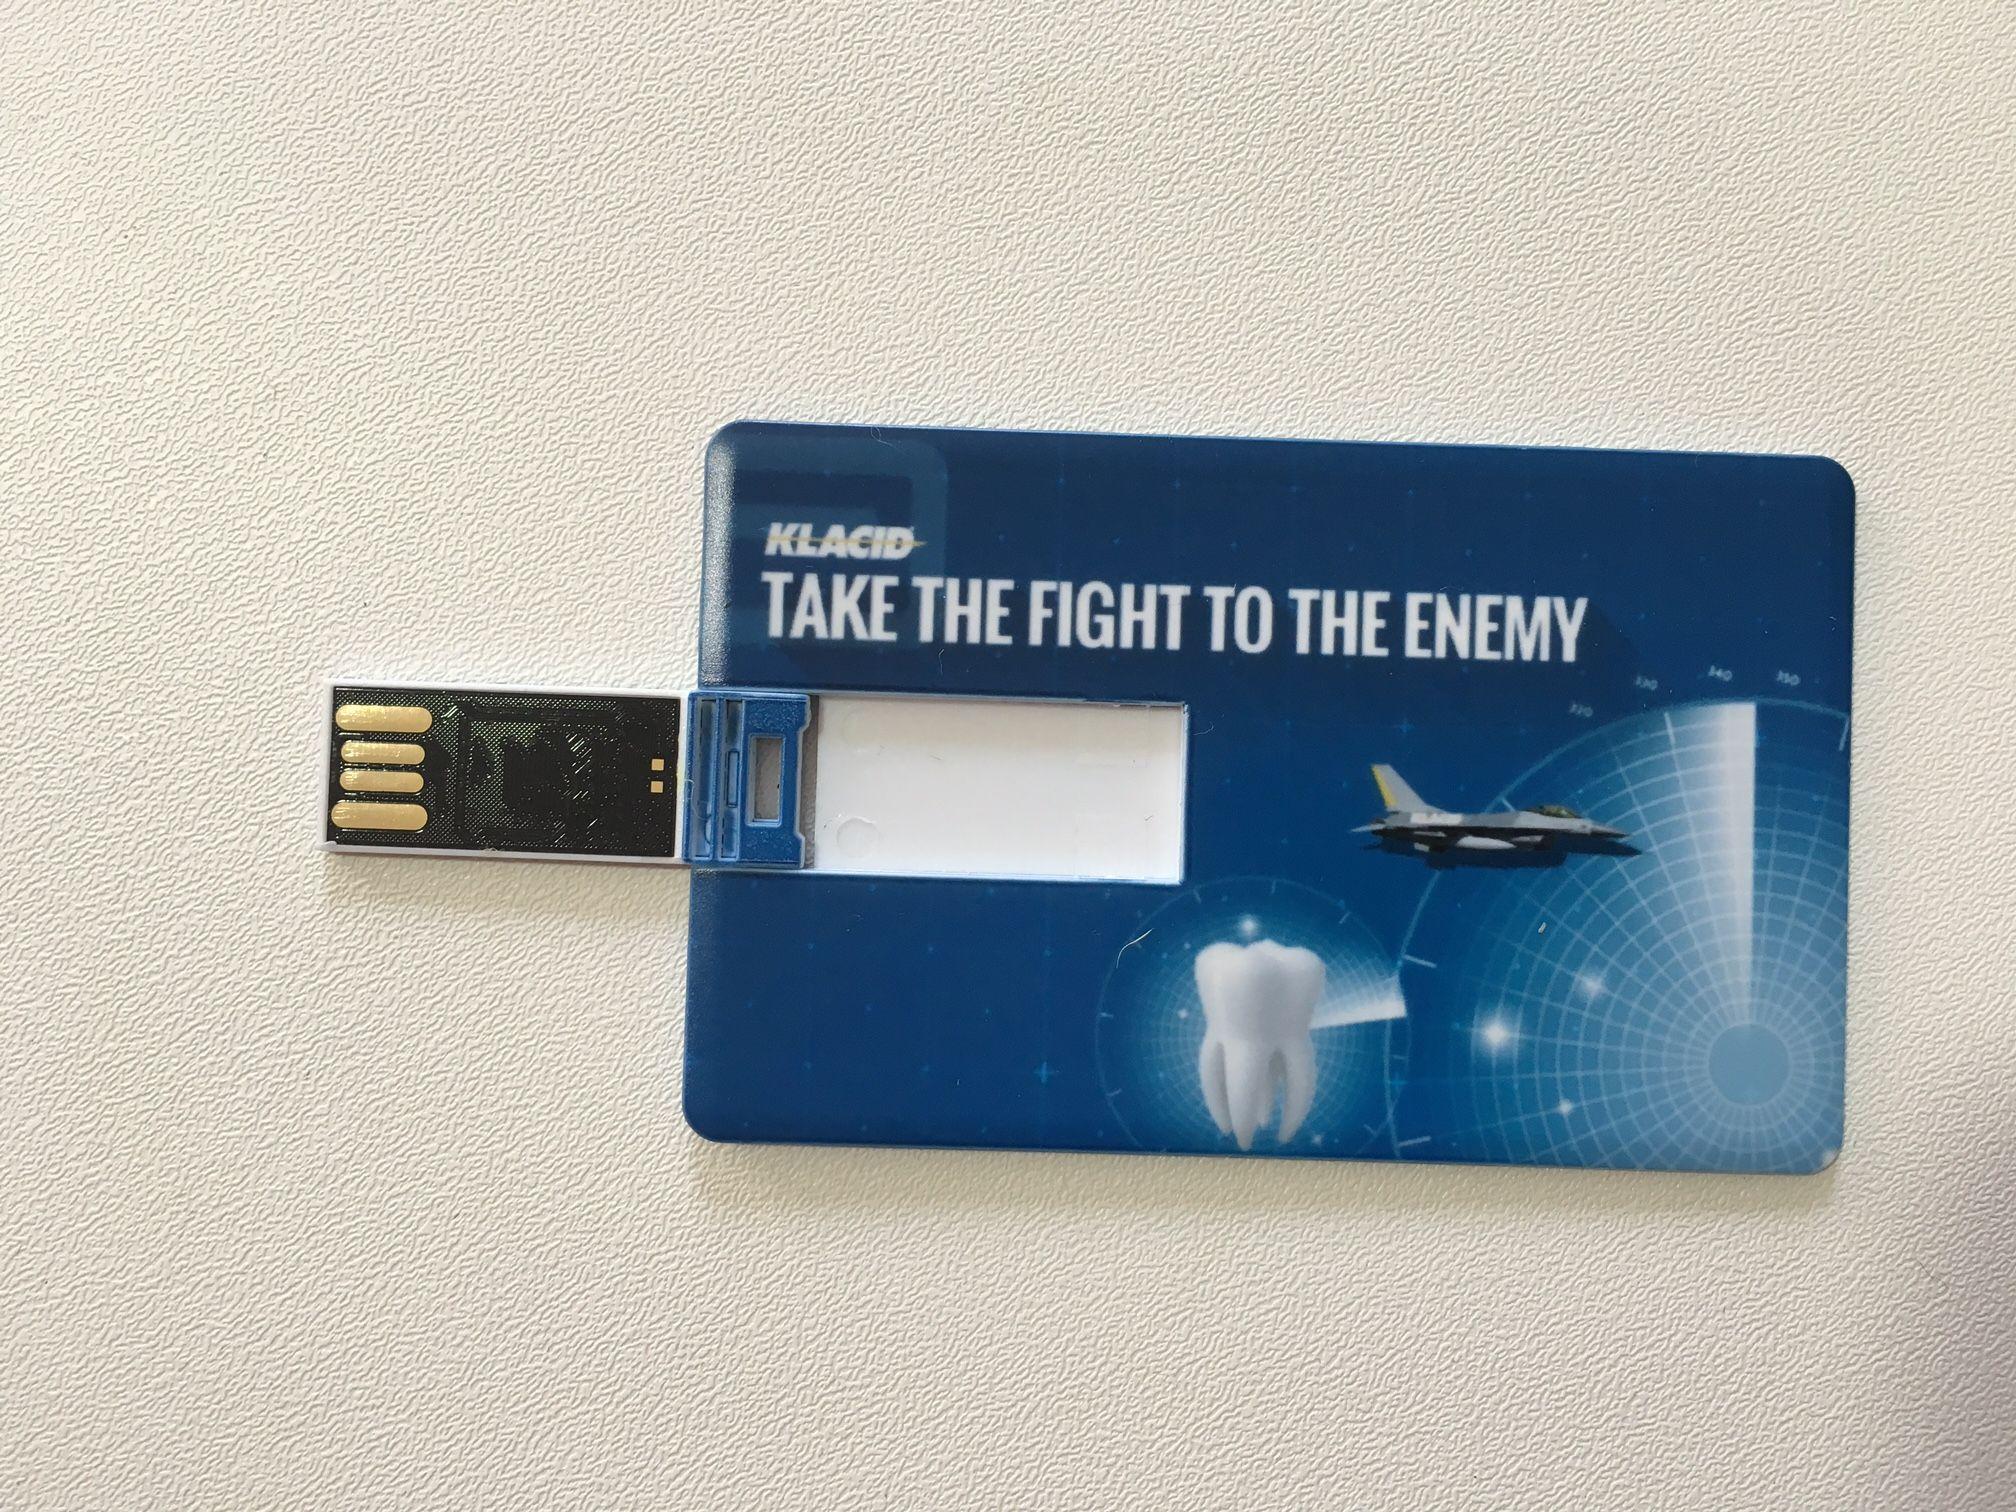 Credit card usb usb usb flash drive promo gifts